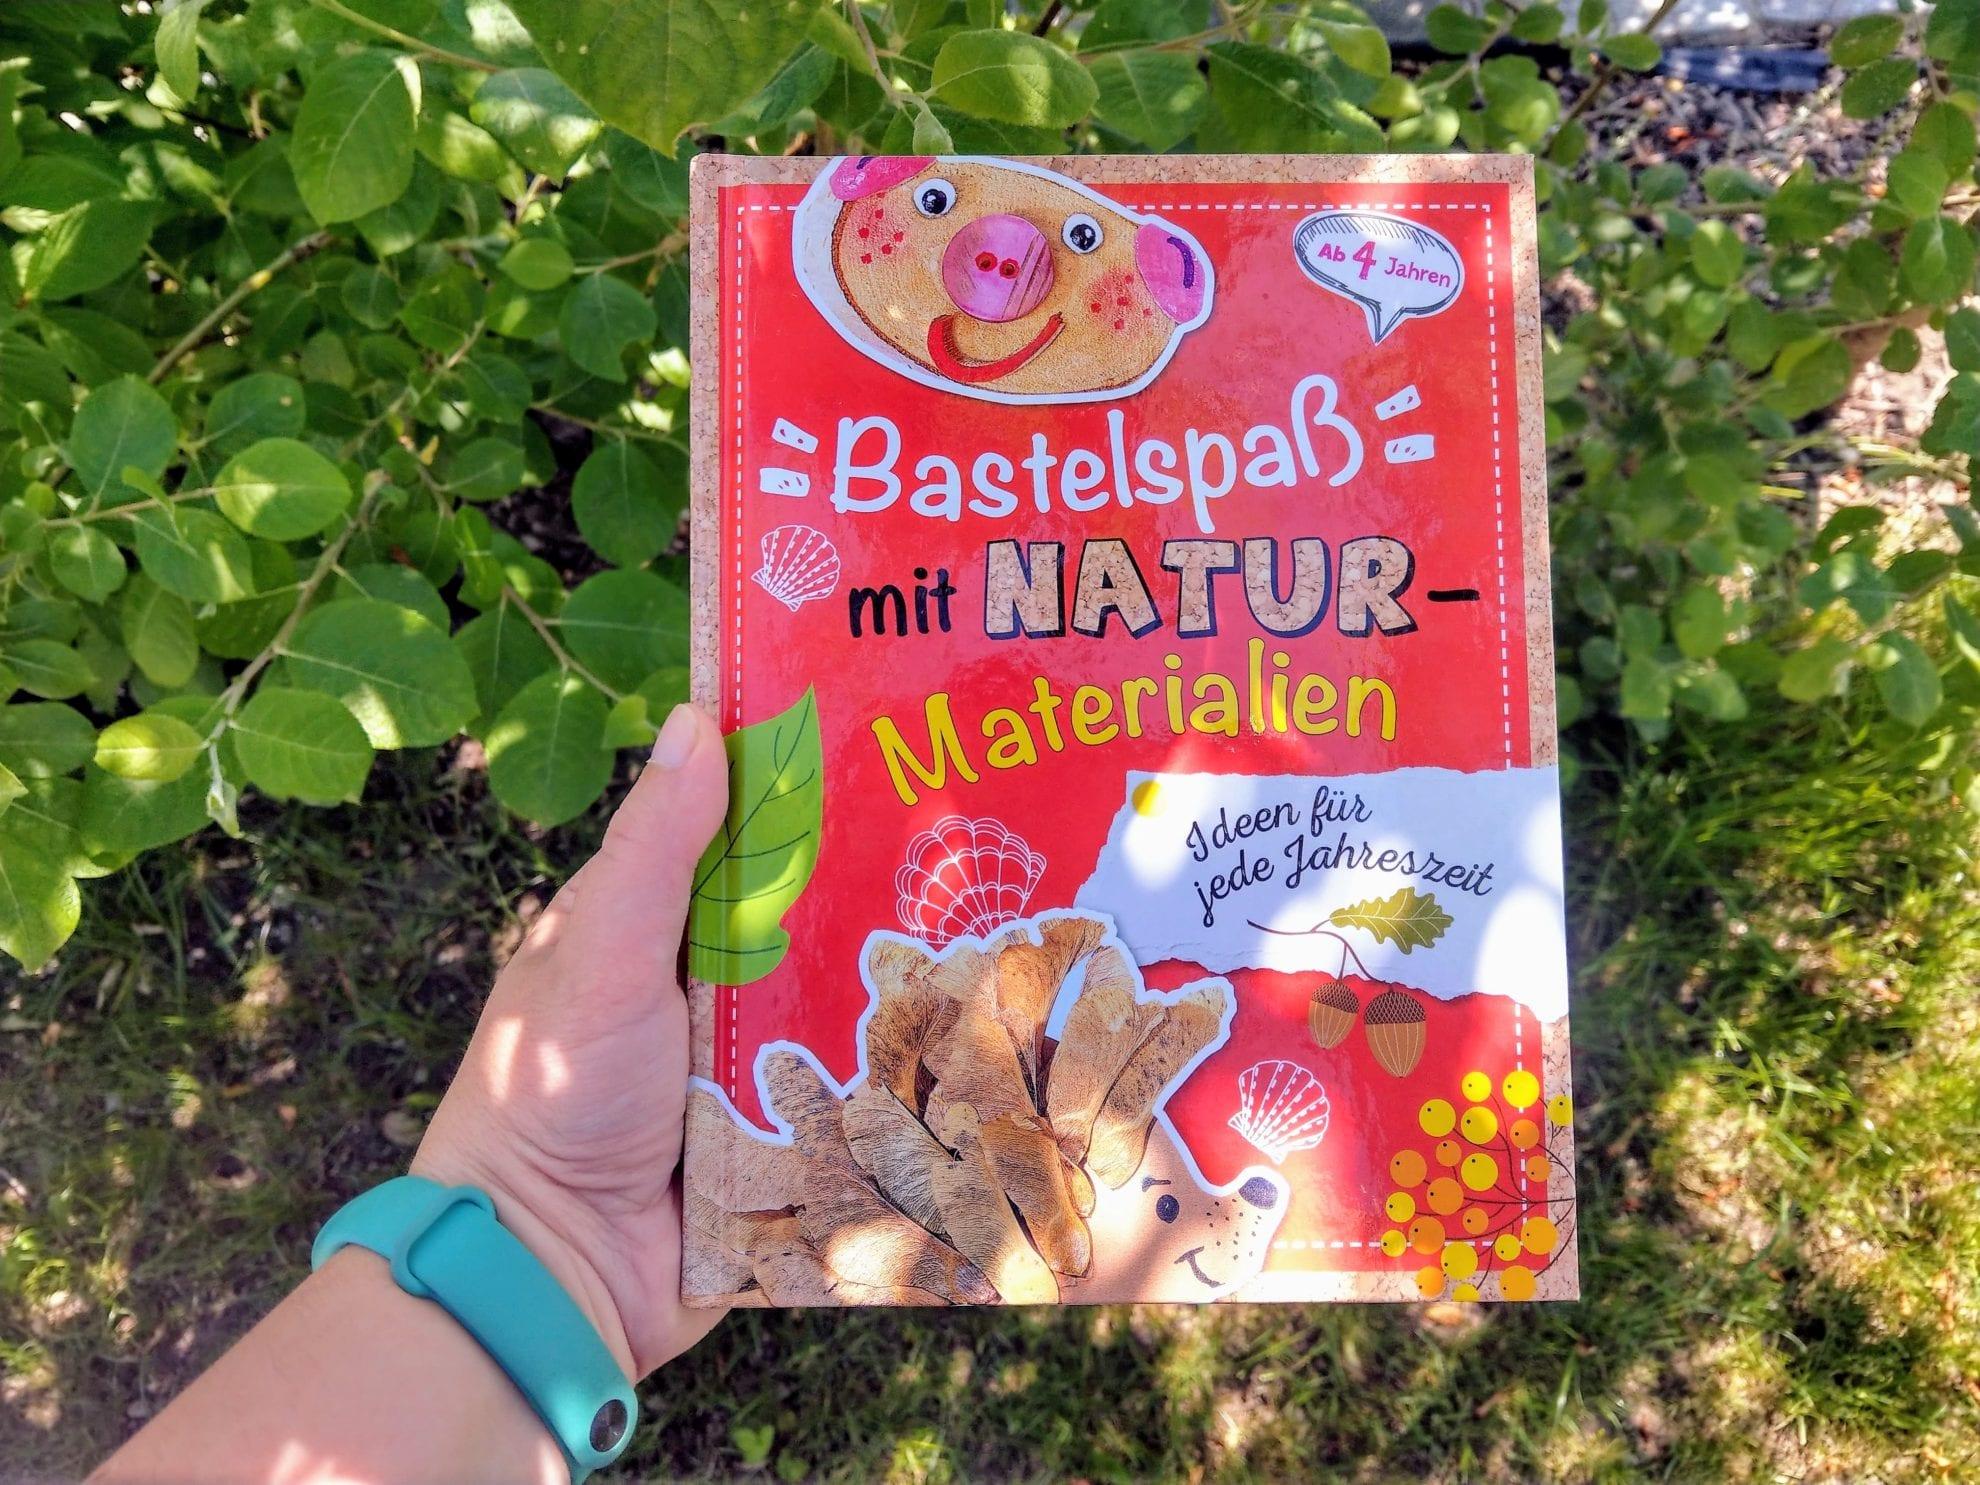 Freitagslieblinge am 7.6.19, Lieblingsbuch, Mamablog, Puddingklecks